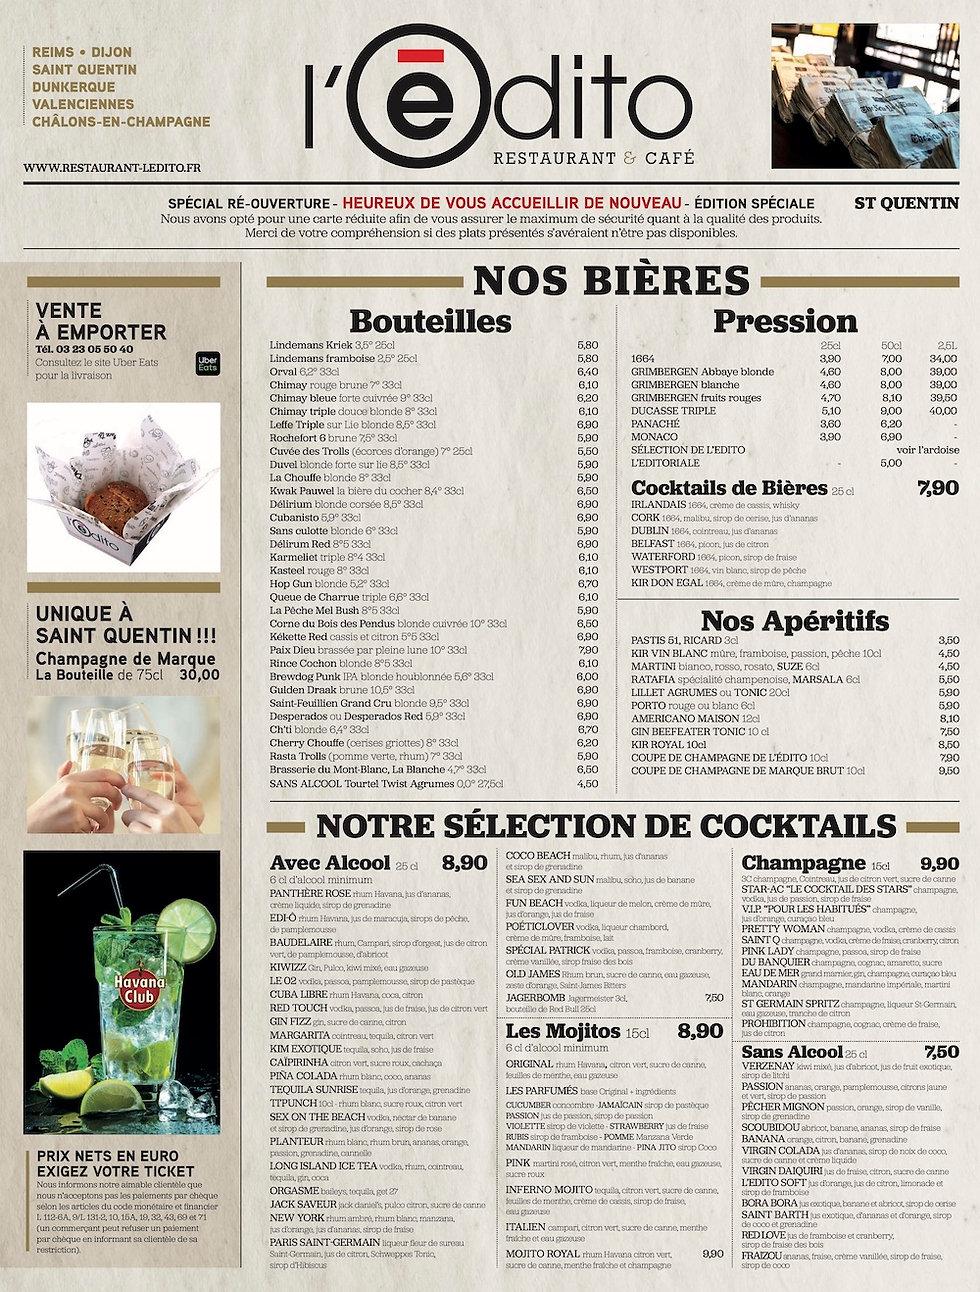 Restaurant_Saint_Quentin_Édito_-Carte_